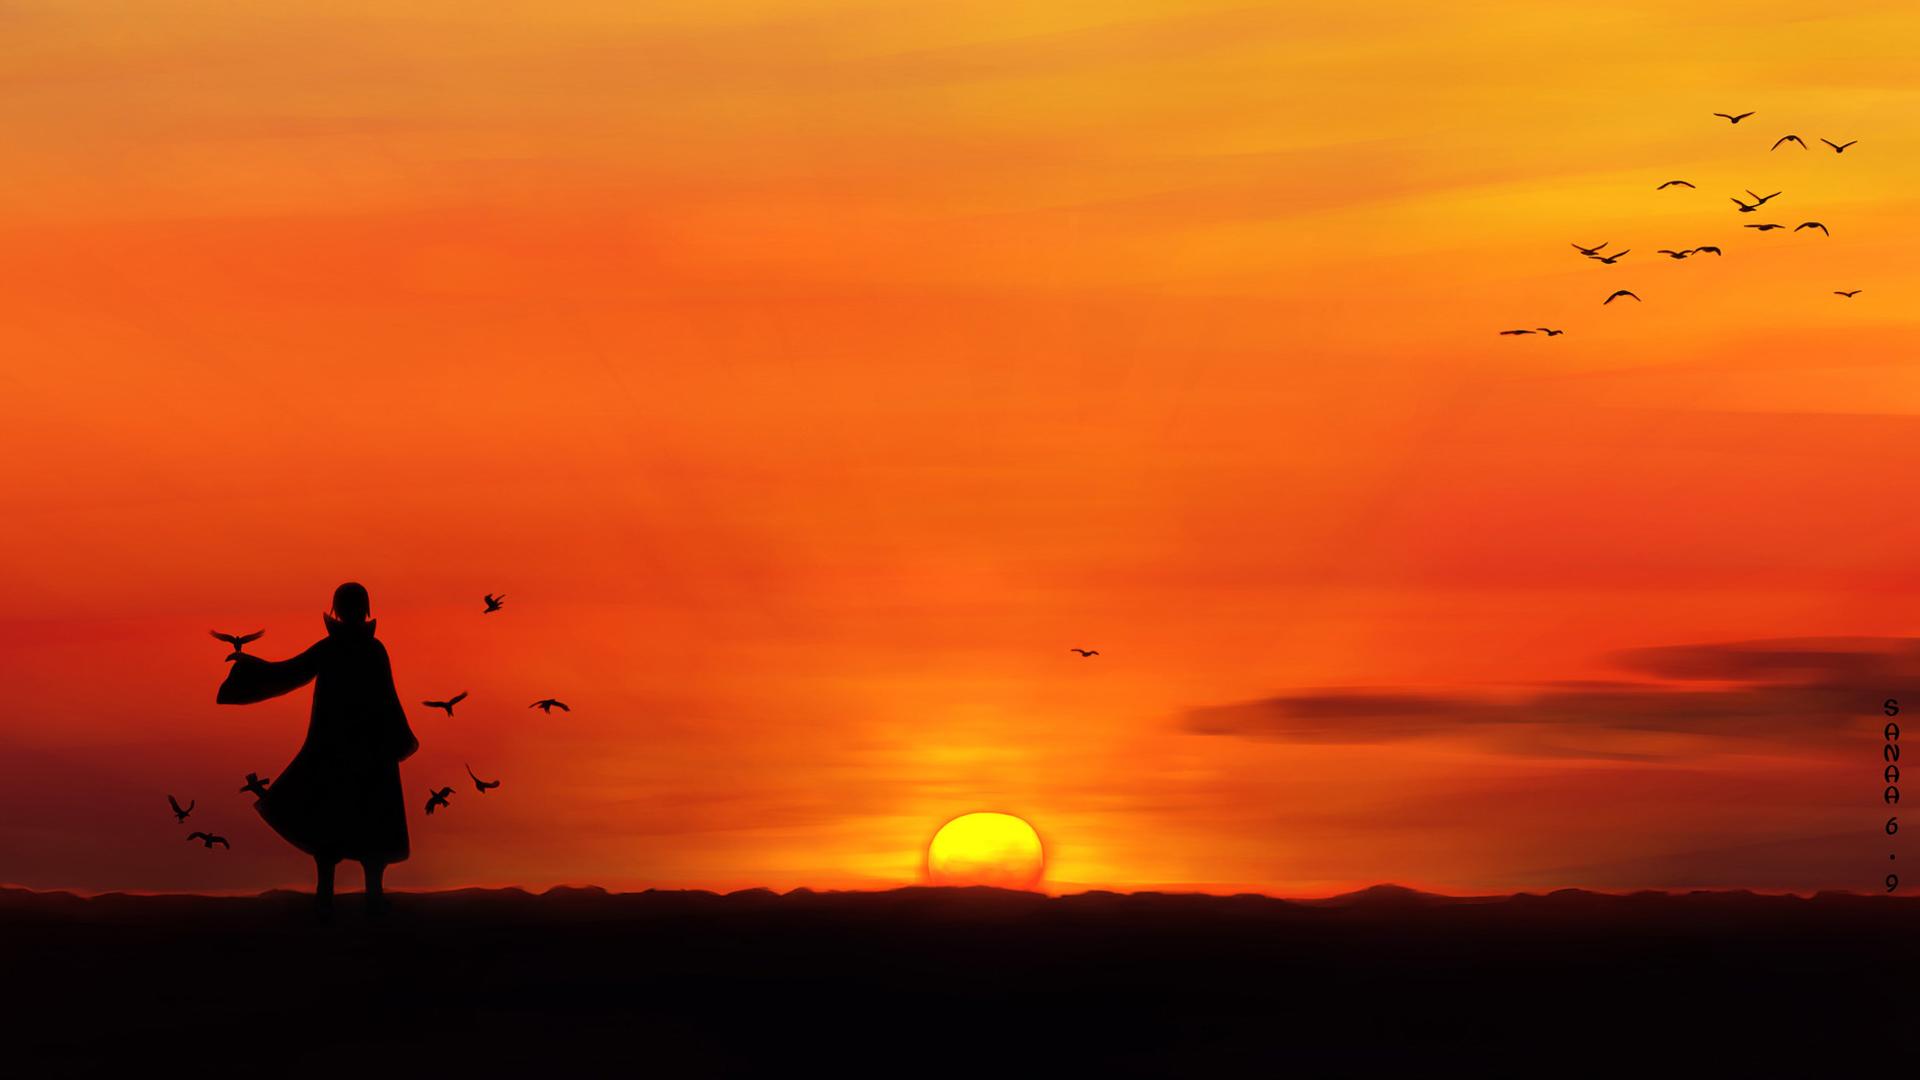 itachi uchiha sunset scenery hd wallpaper full resolution 1920x1080 1920x1080